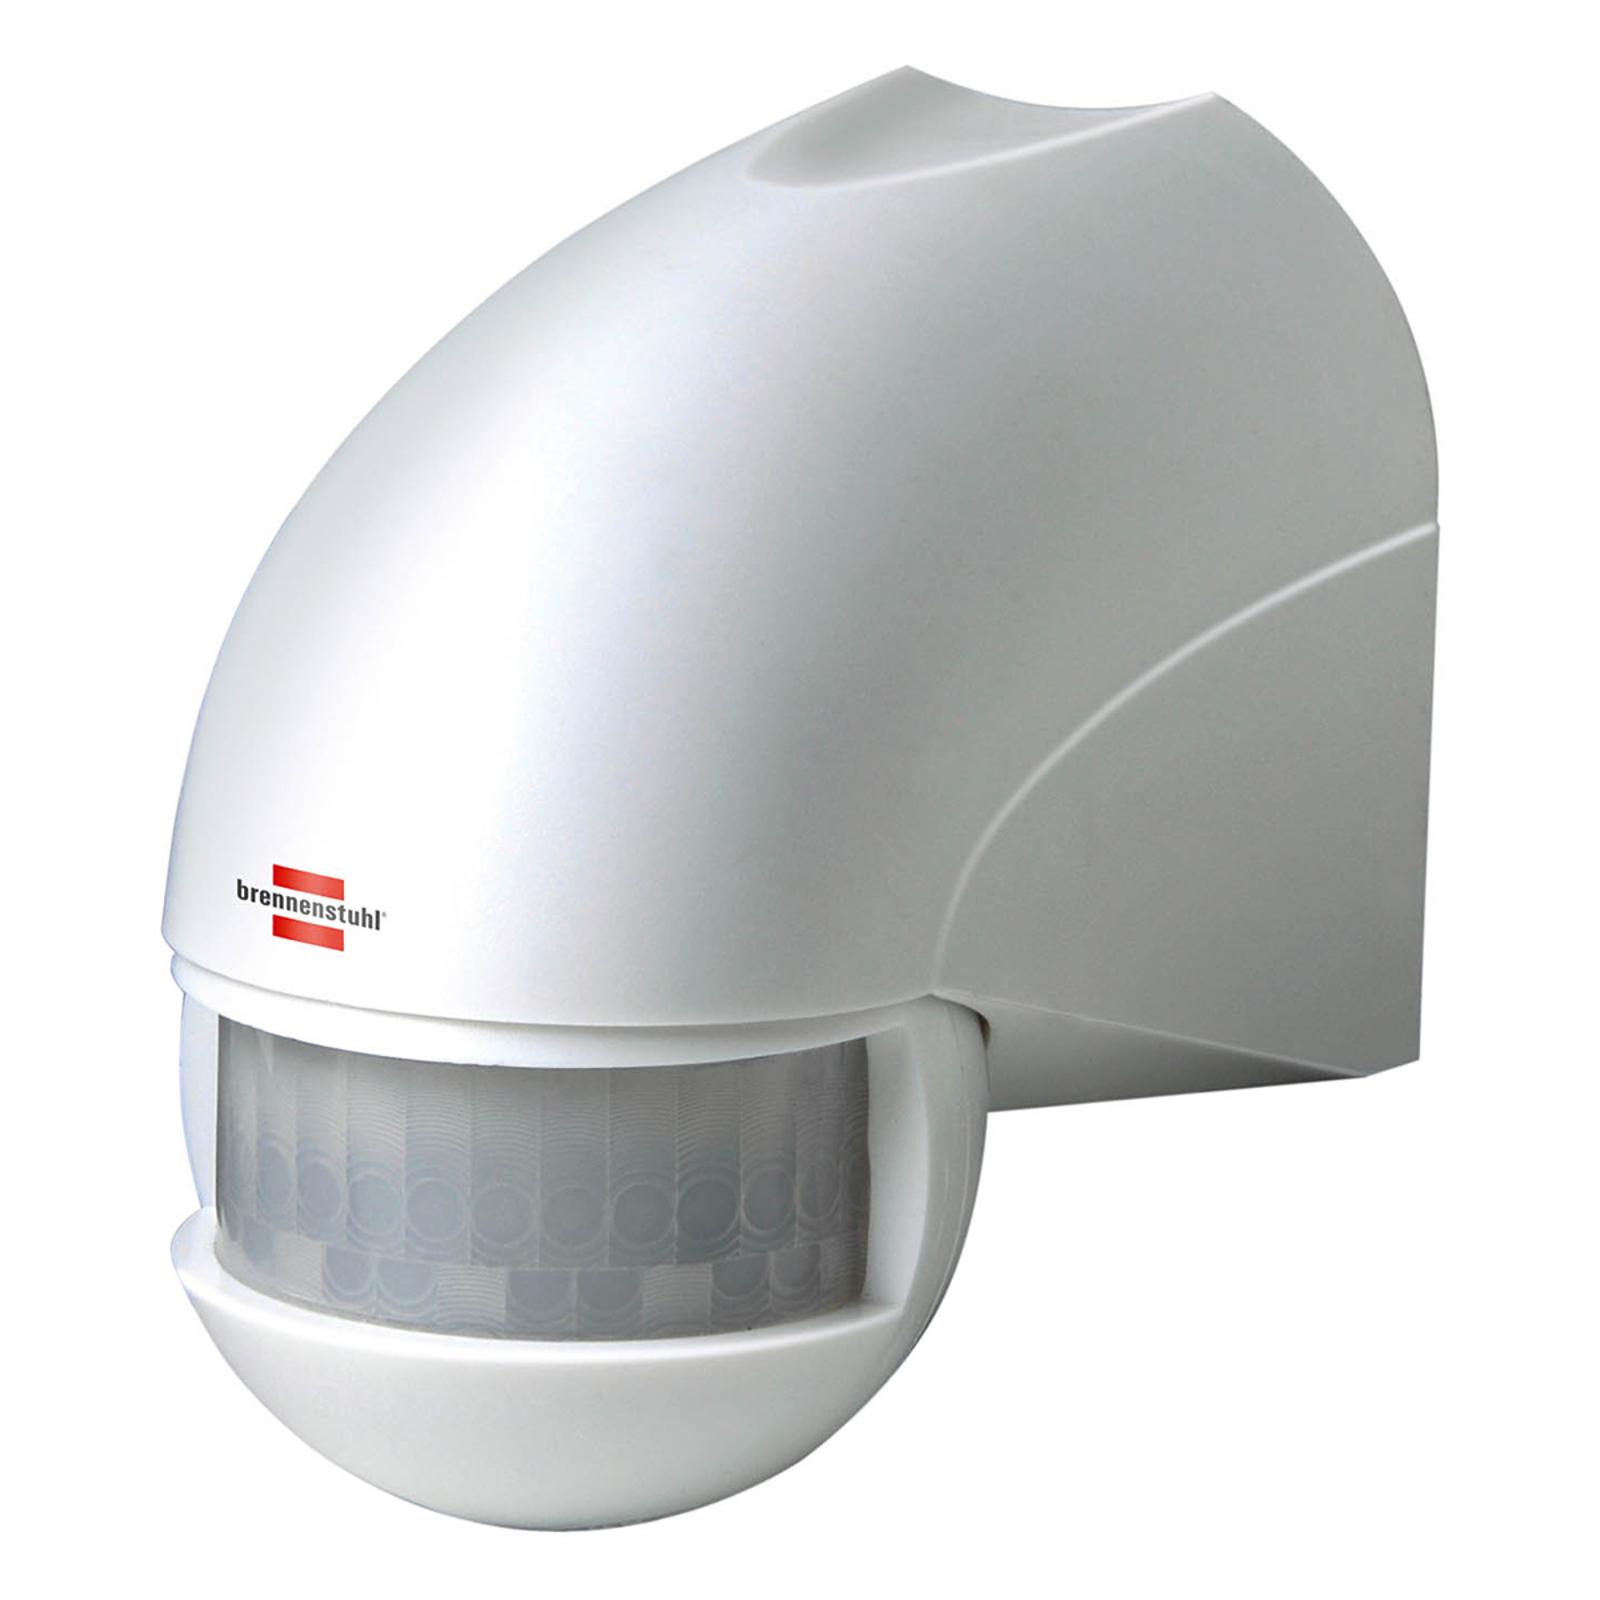 PIR 180 IP44 infrared motion detector_1540114_1